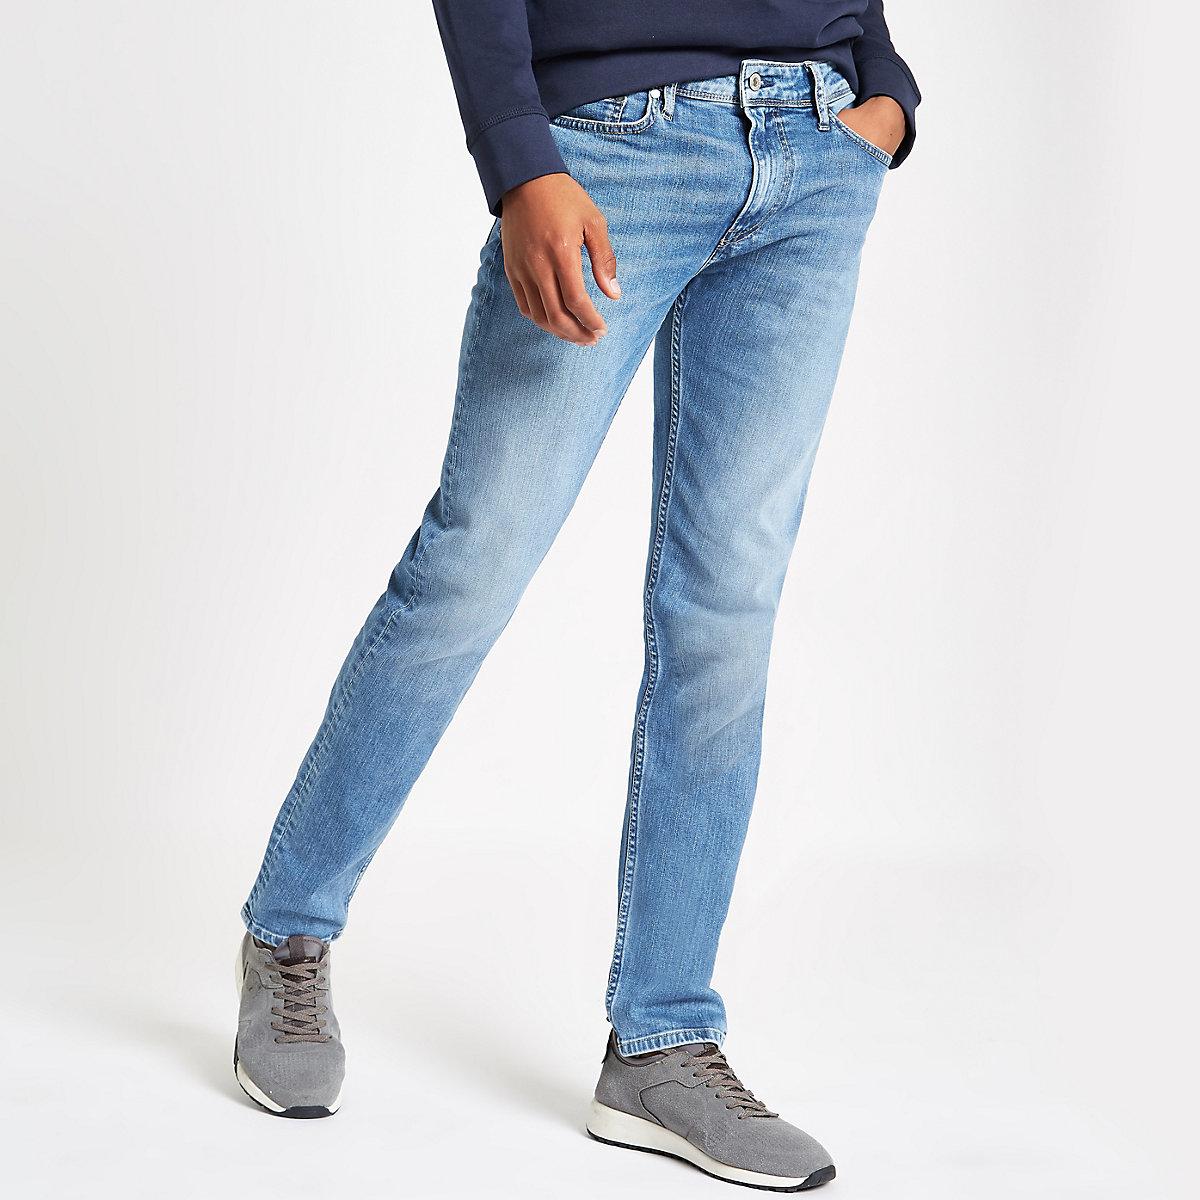 Pepe Pepe Jeans Jeans Jeans Pepe Pepe Pepe Jeans Pepe Jeans fExxRTwFqa